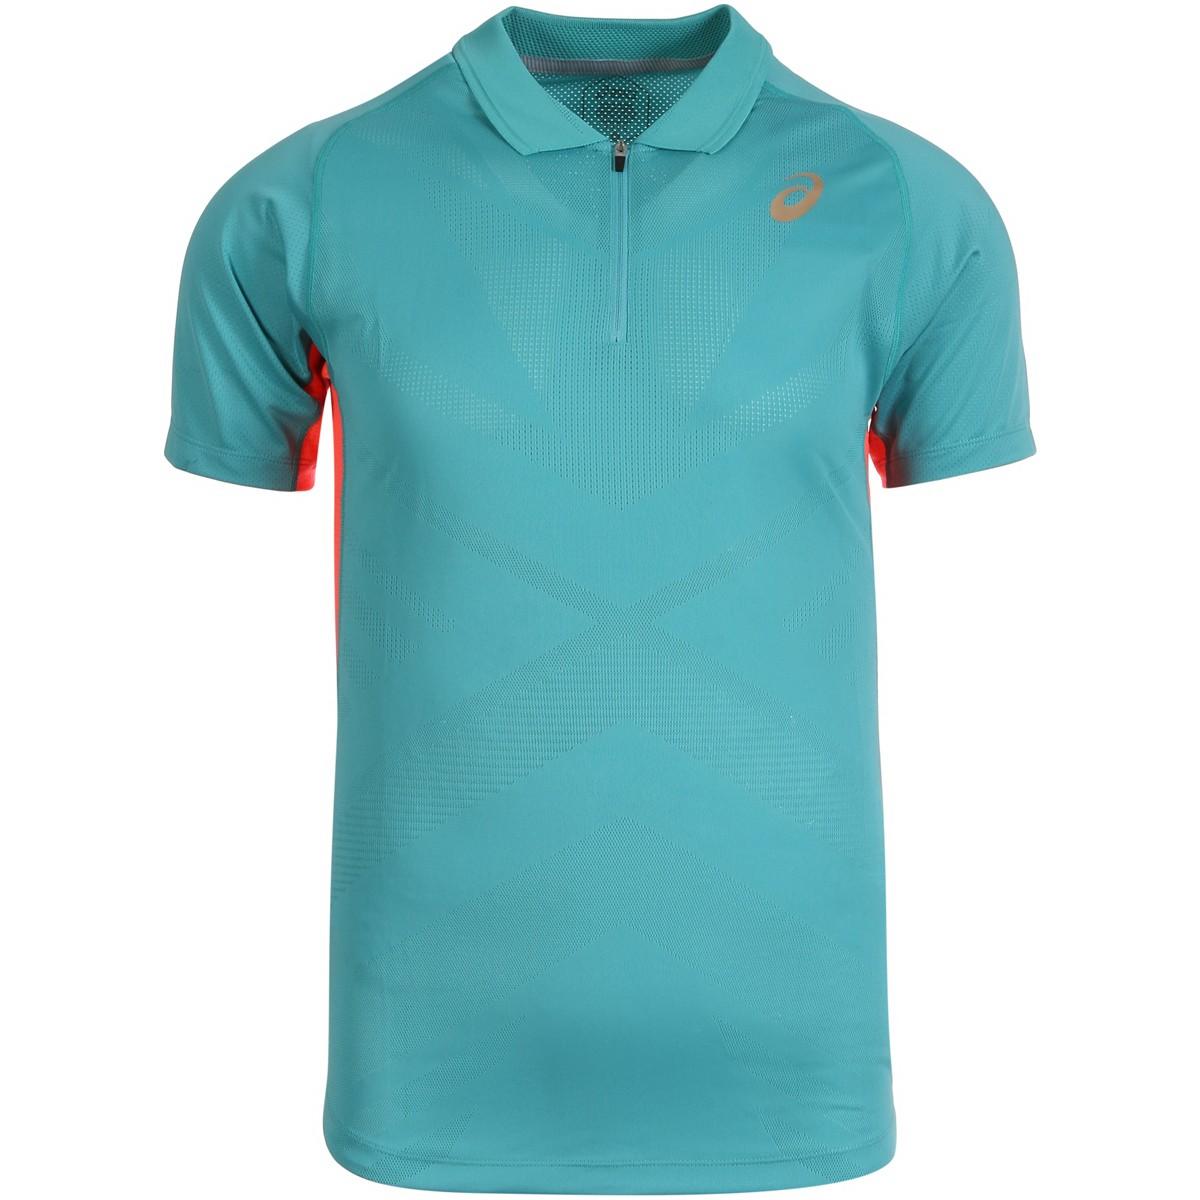 ASICS ELITE POLO - ASICS - Men's - Clothing | Tennispro